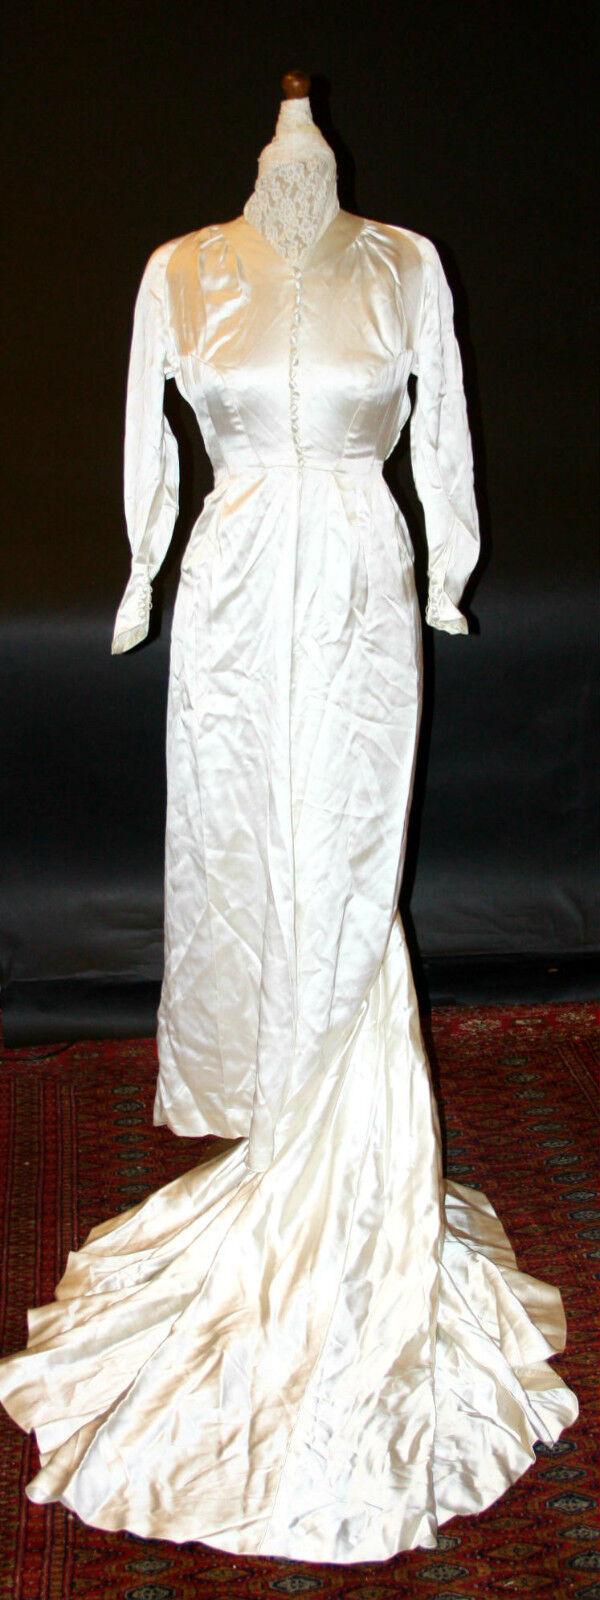 EXCEPTIONAL WEDDING GOWN. COUTURIER HANDMADE. SATIN SILK. FRANCE. CIRCA 1945